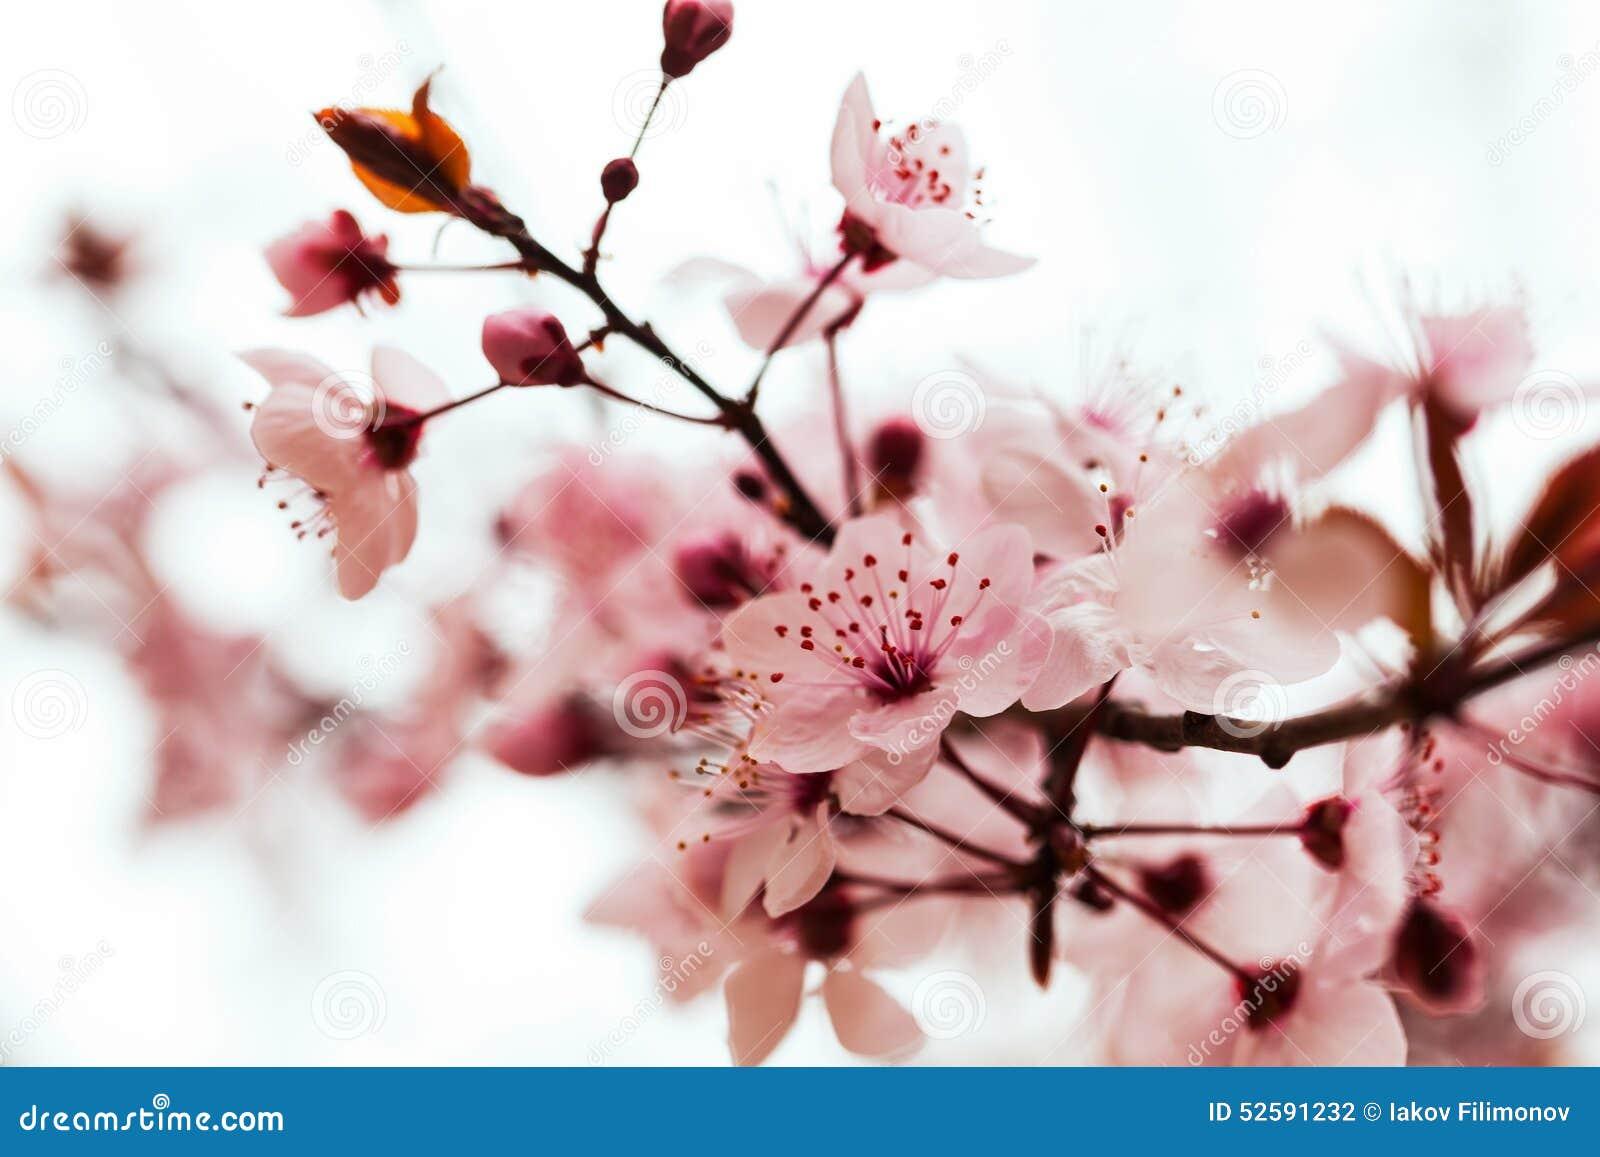 branche d 39 arbre en fleur photo stock image 52591232. Black Bedroom Furniture Sets. Home Design Ideas